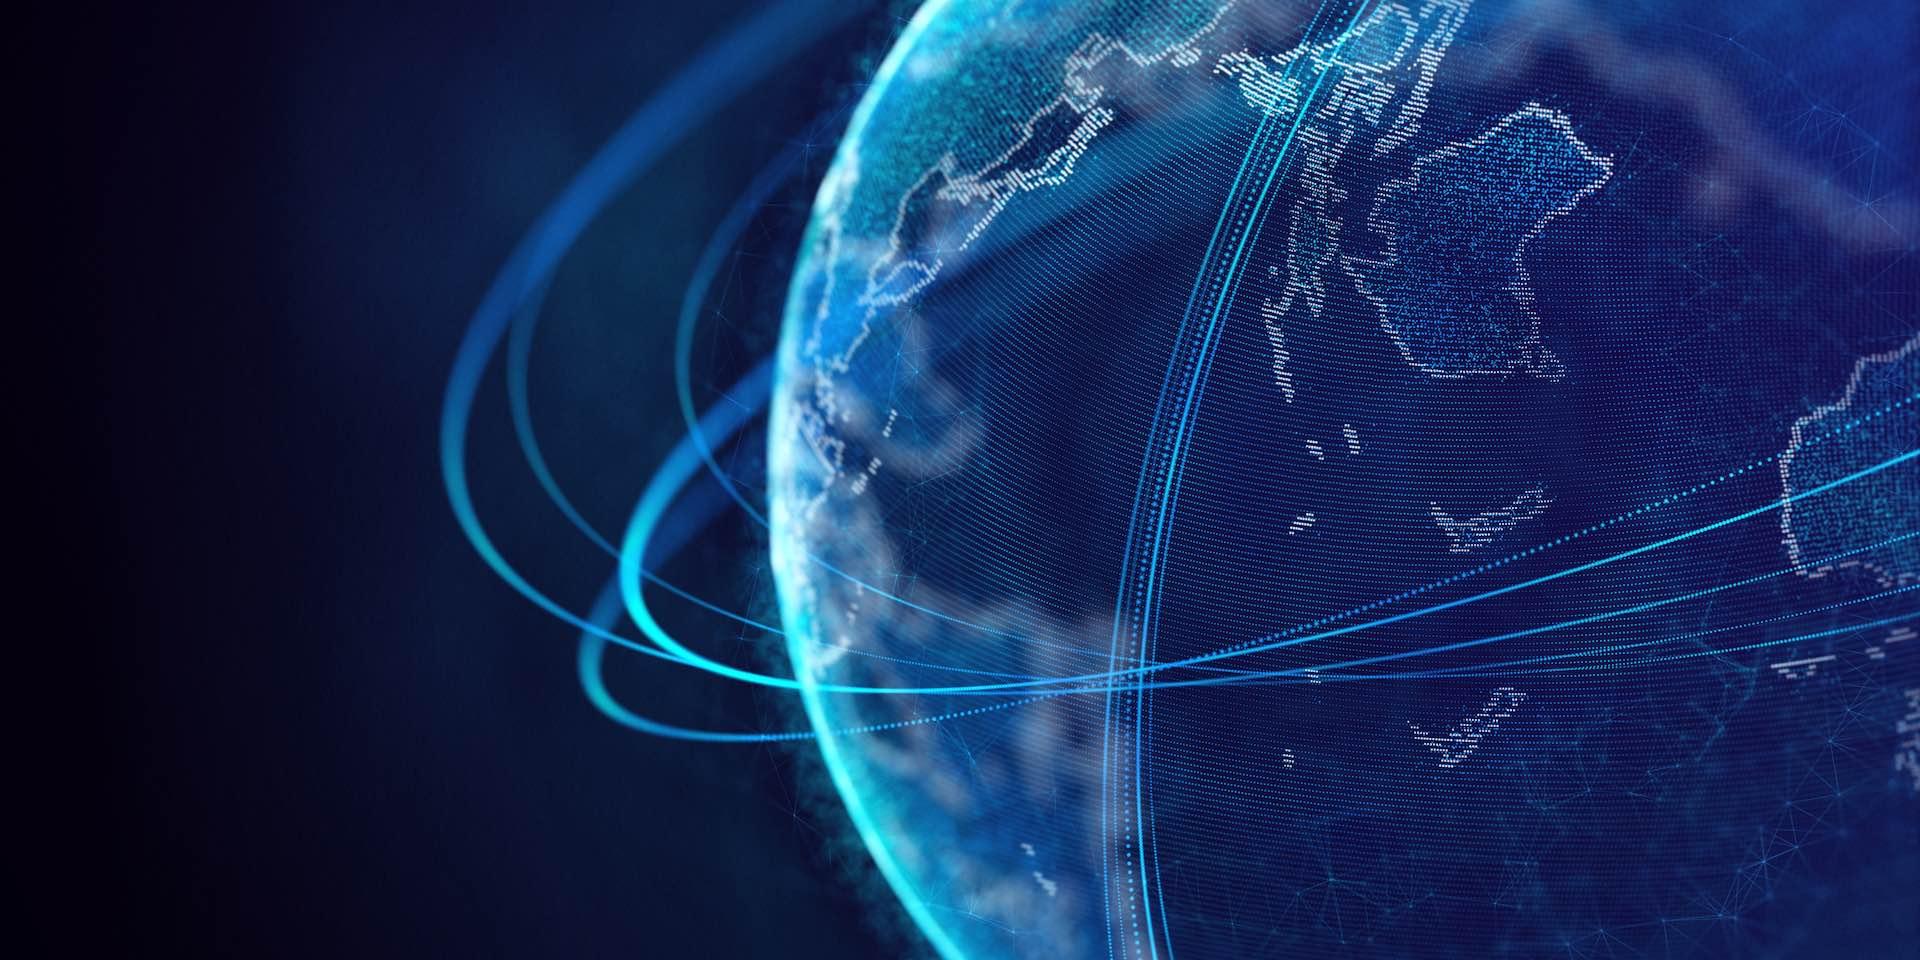 Bringing Awareness To The Society Regarding Several Malware In Play Through DNS Filtering